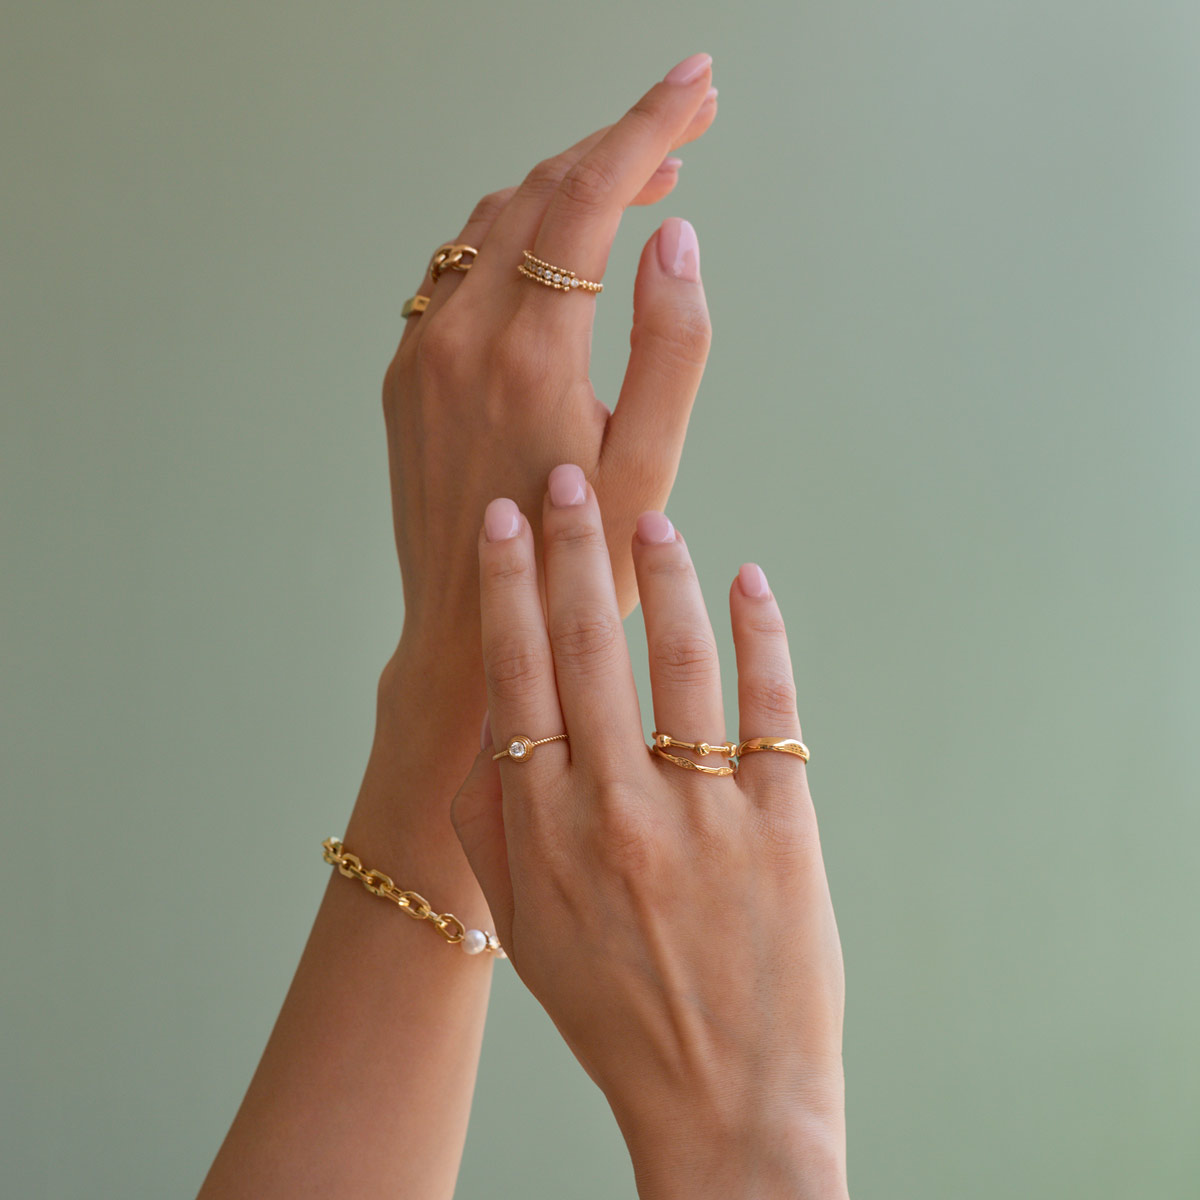 انگشتر طلا آلورا